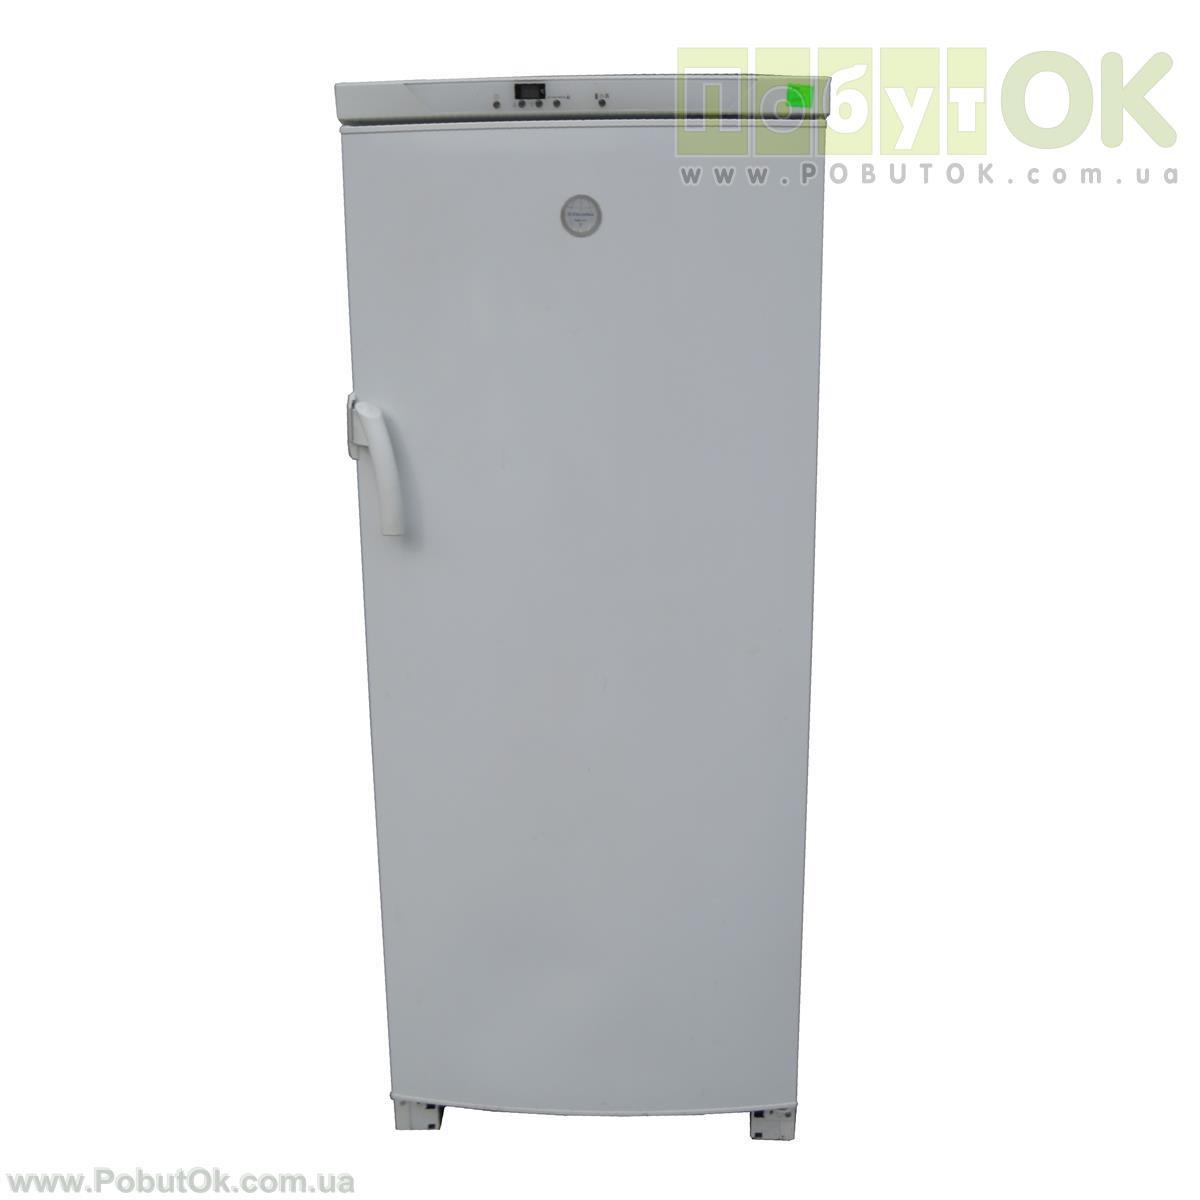 Морозильная Камера ELECTROLUX EUF2701 (Код:0814) Состояние: Б/У